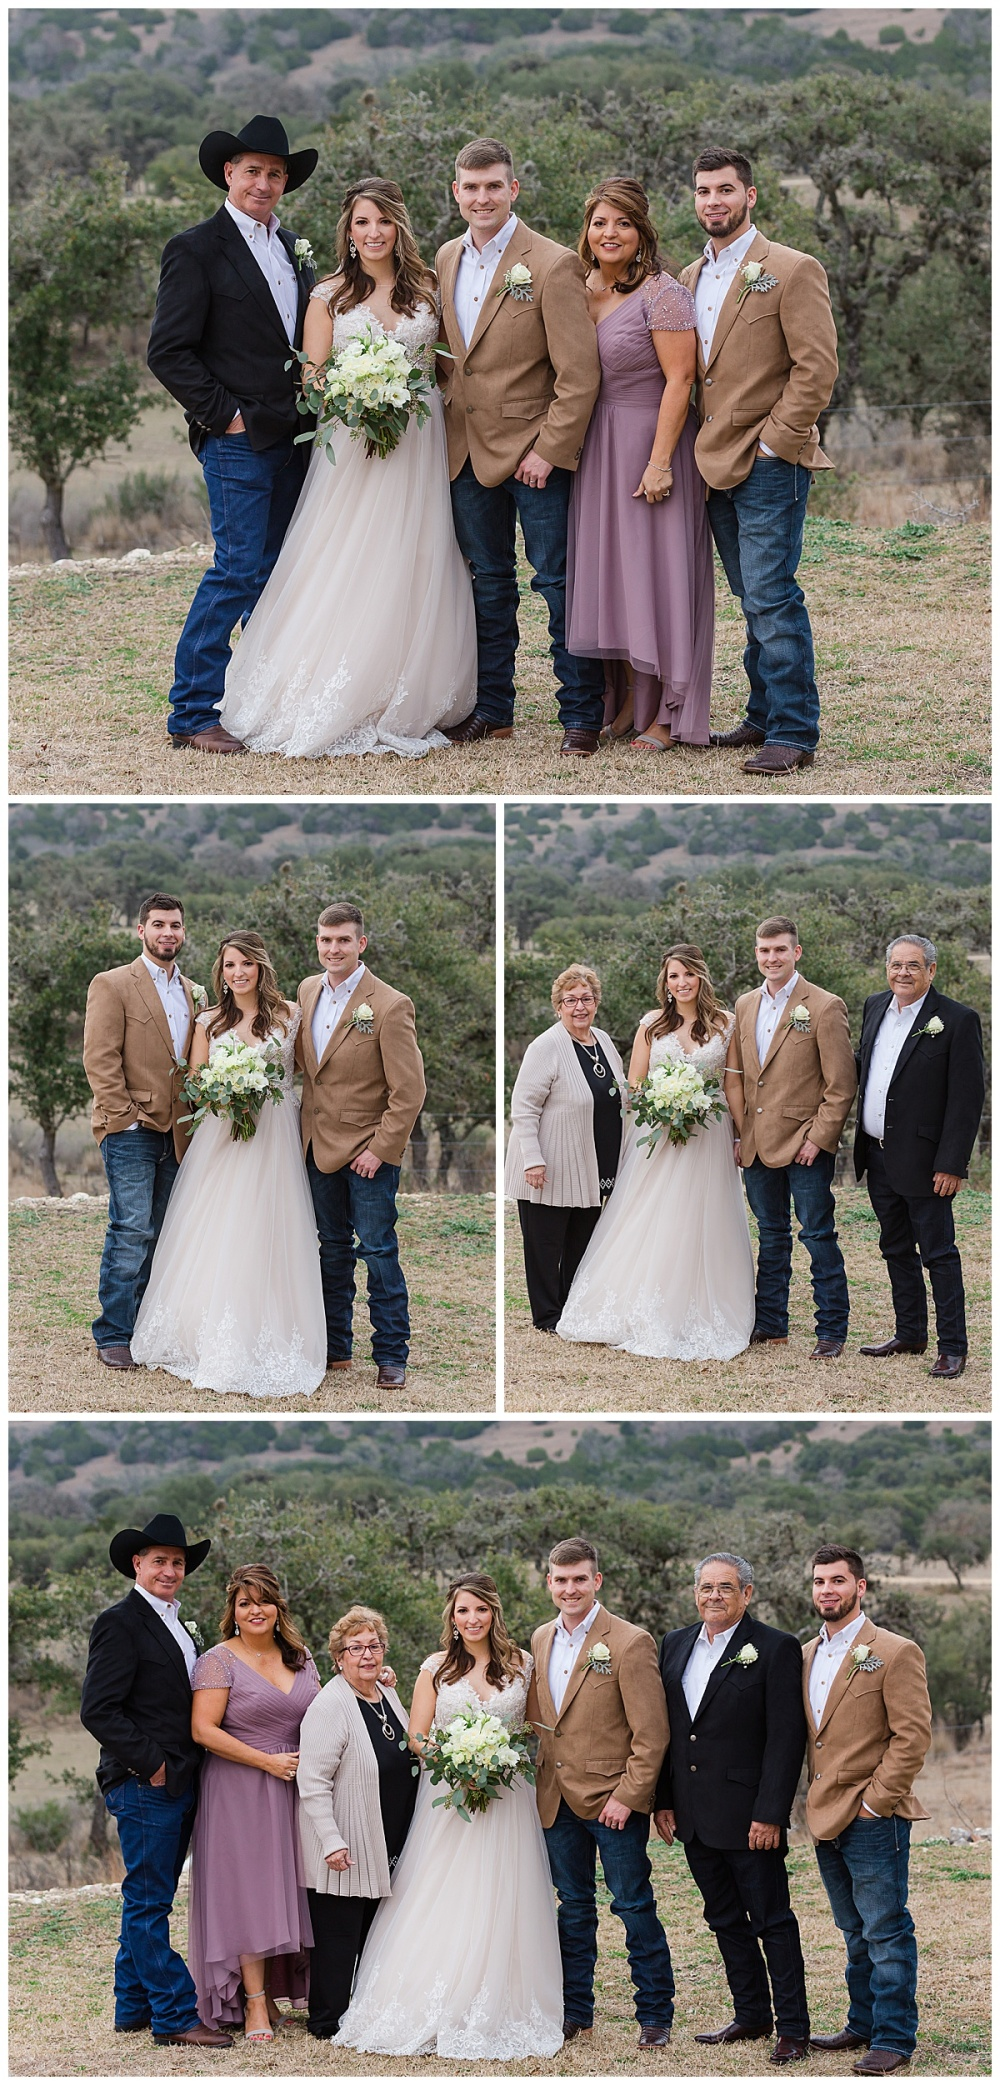 Wedding-Photographer-Texas-Hill-Country-Happy-H-Ranch-Comfor-Texas-Carly-Barton-Photography_0035.jpg